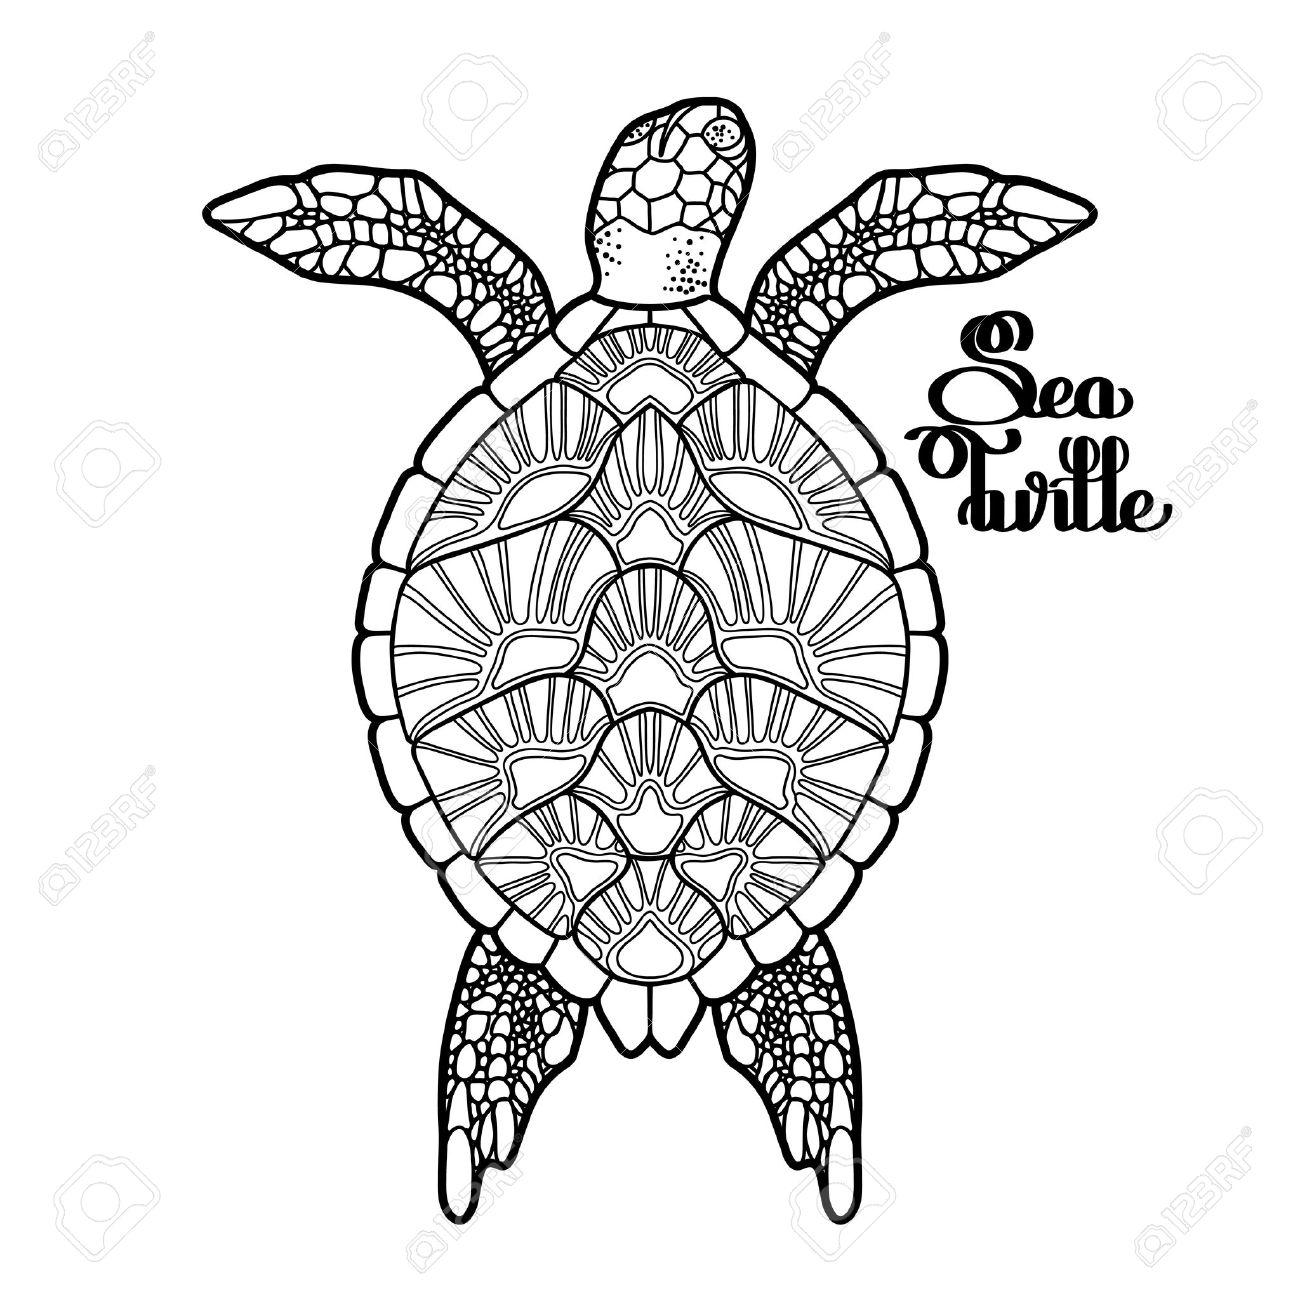 1300x1300 Graphic Hawksbill Sea Turtle Drawn In Line Art Style. Ocean Vector